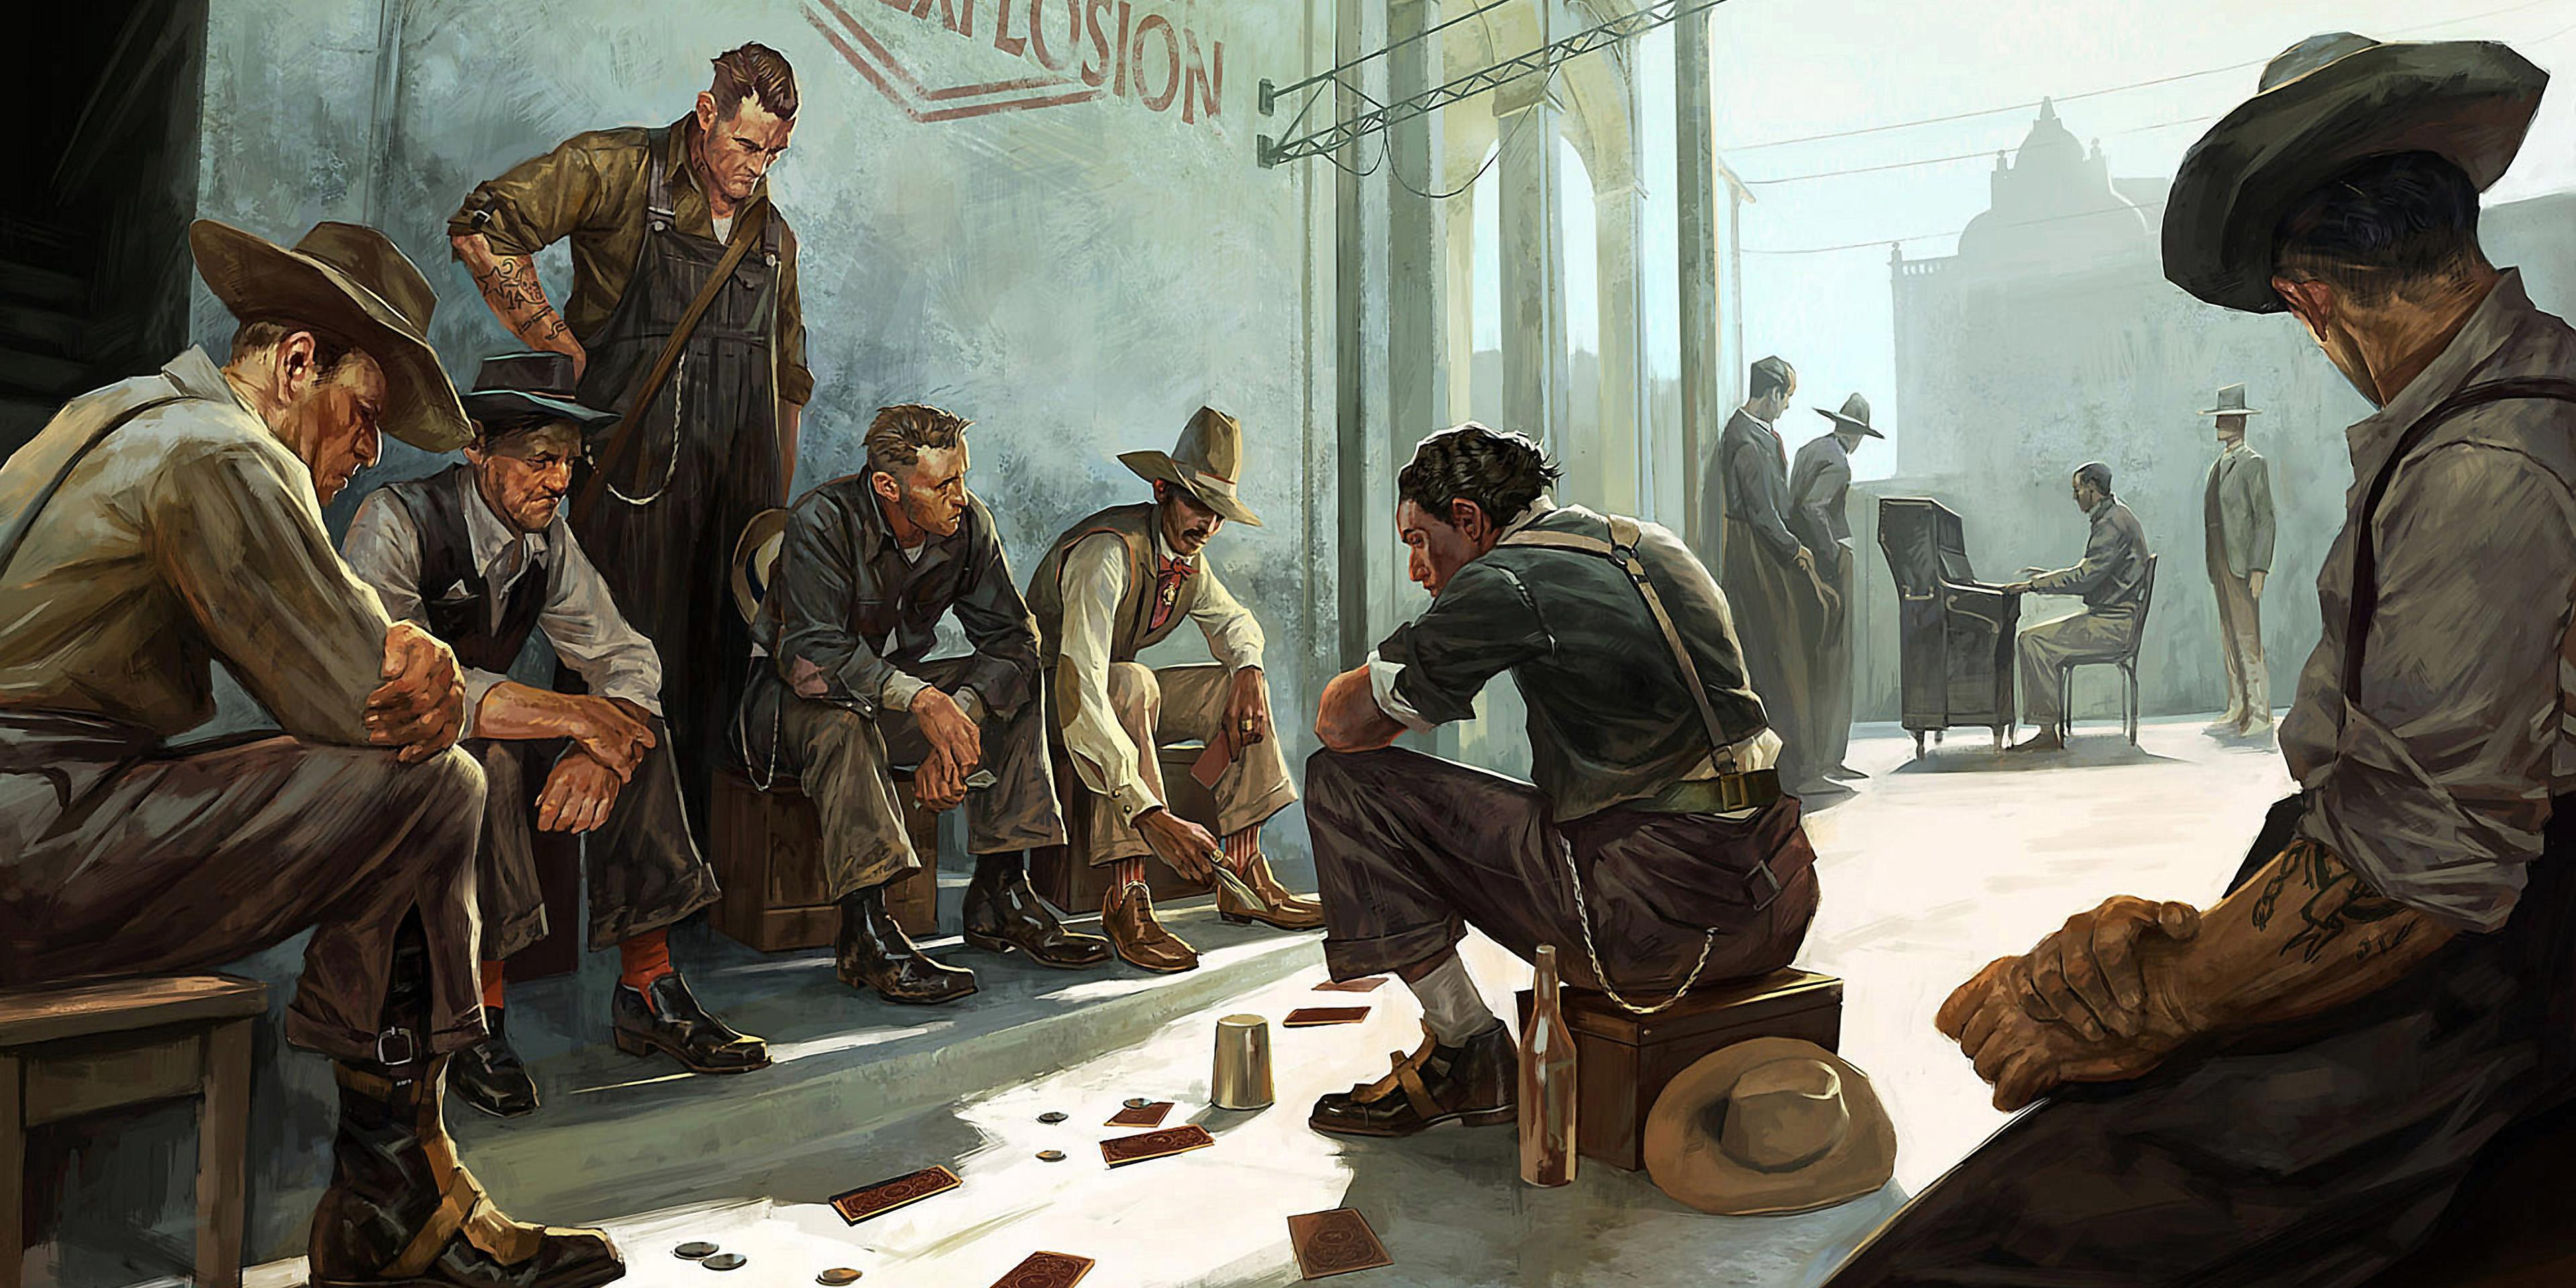 En attendant Dishonored 2